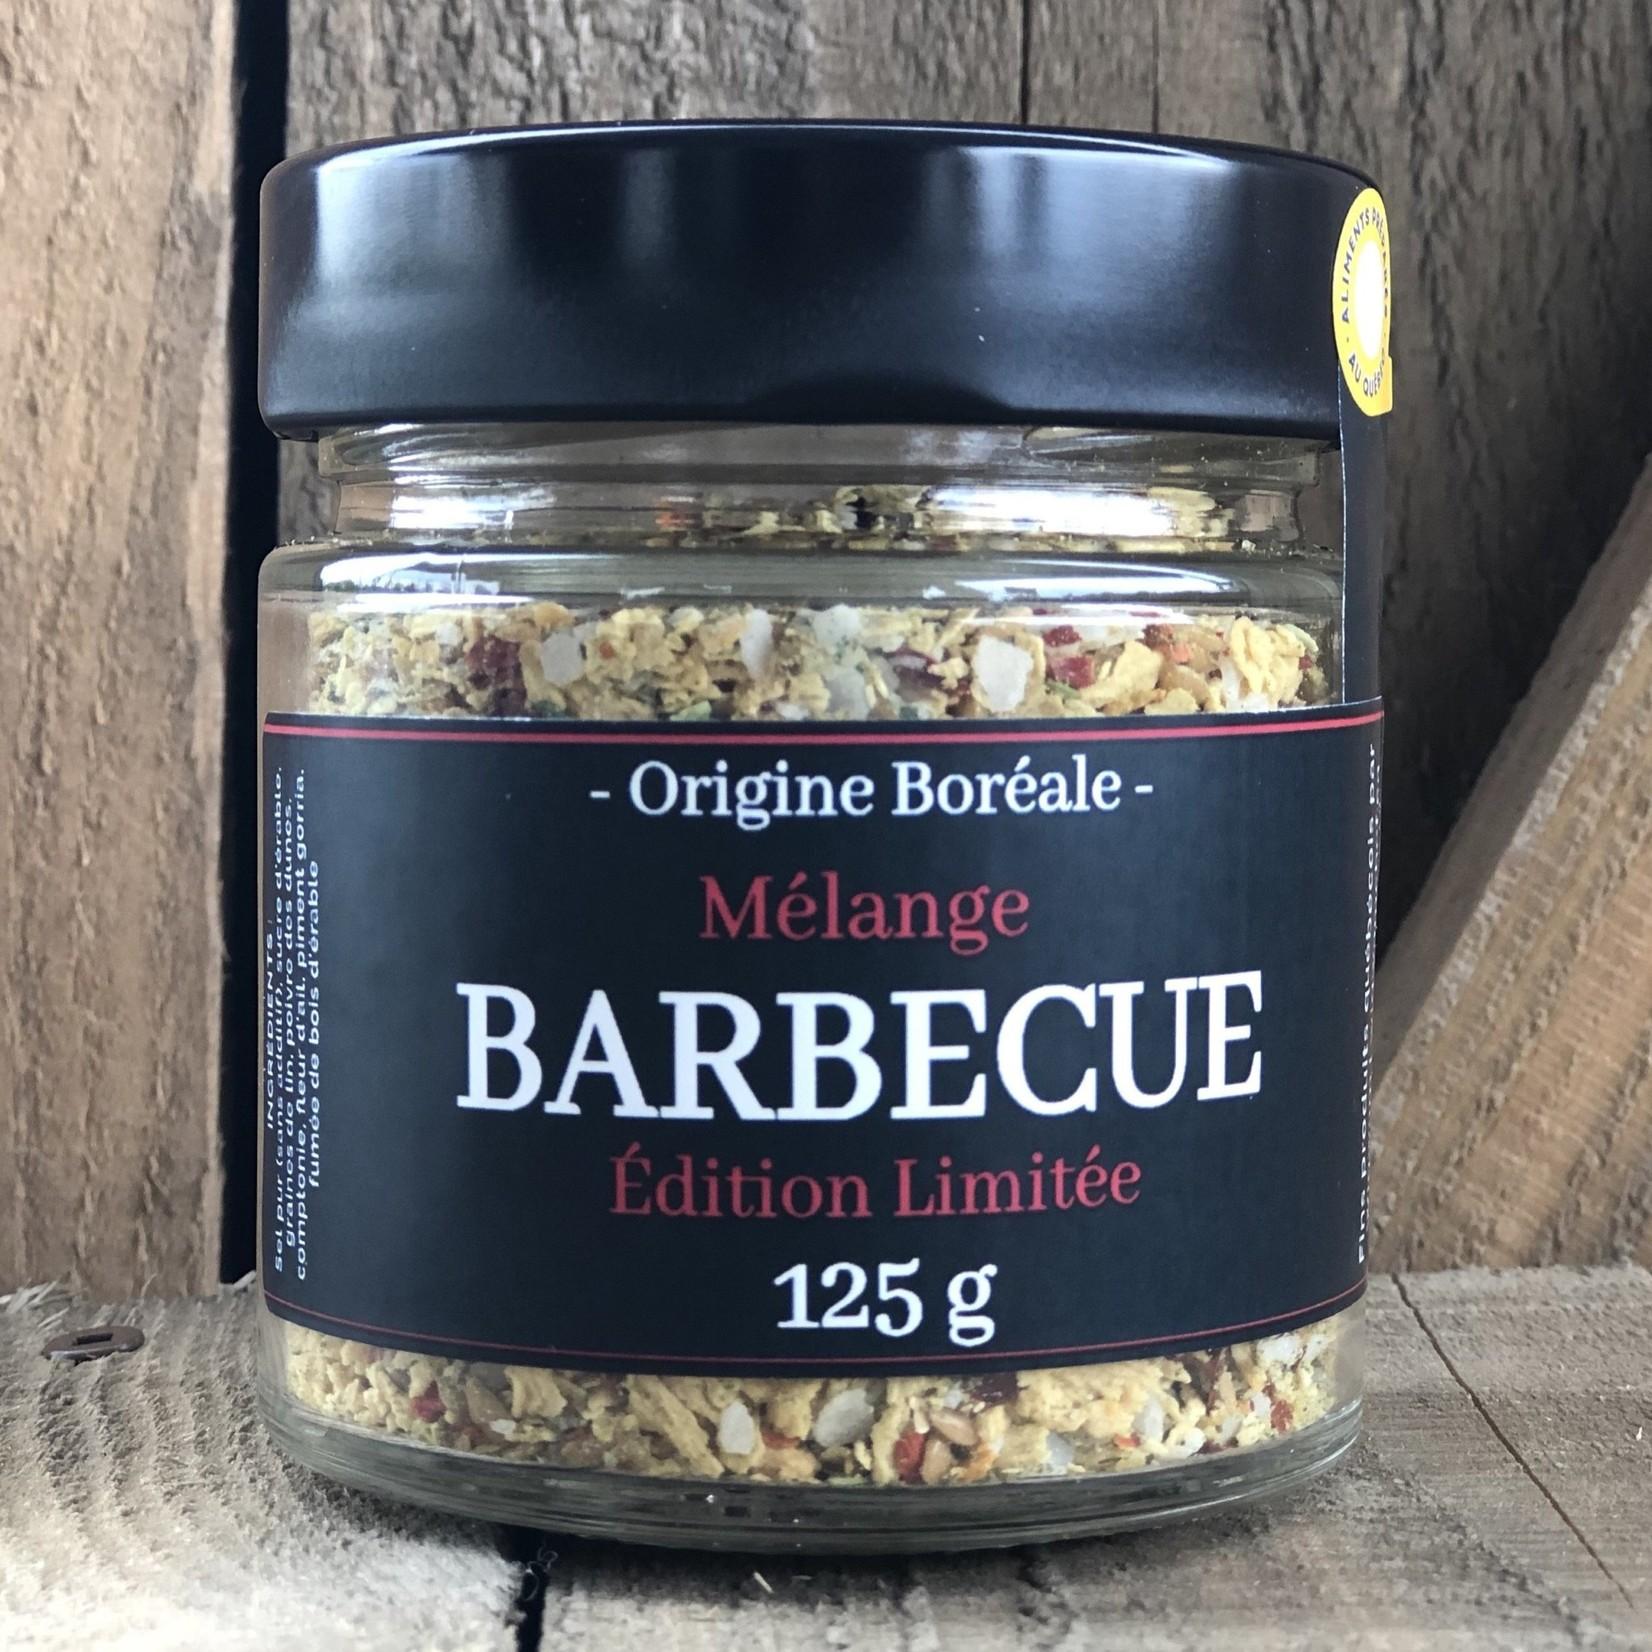 Mélange Barbecue - Origine Boréale - WIGWAM